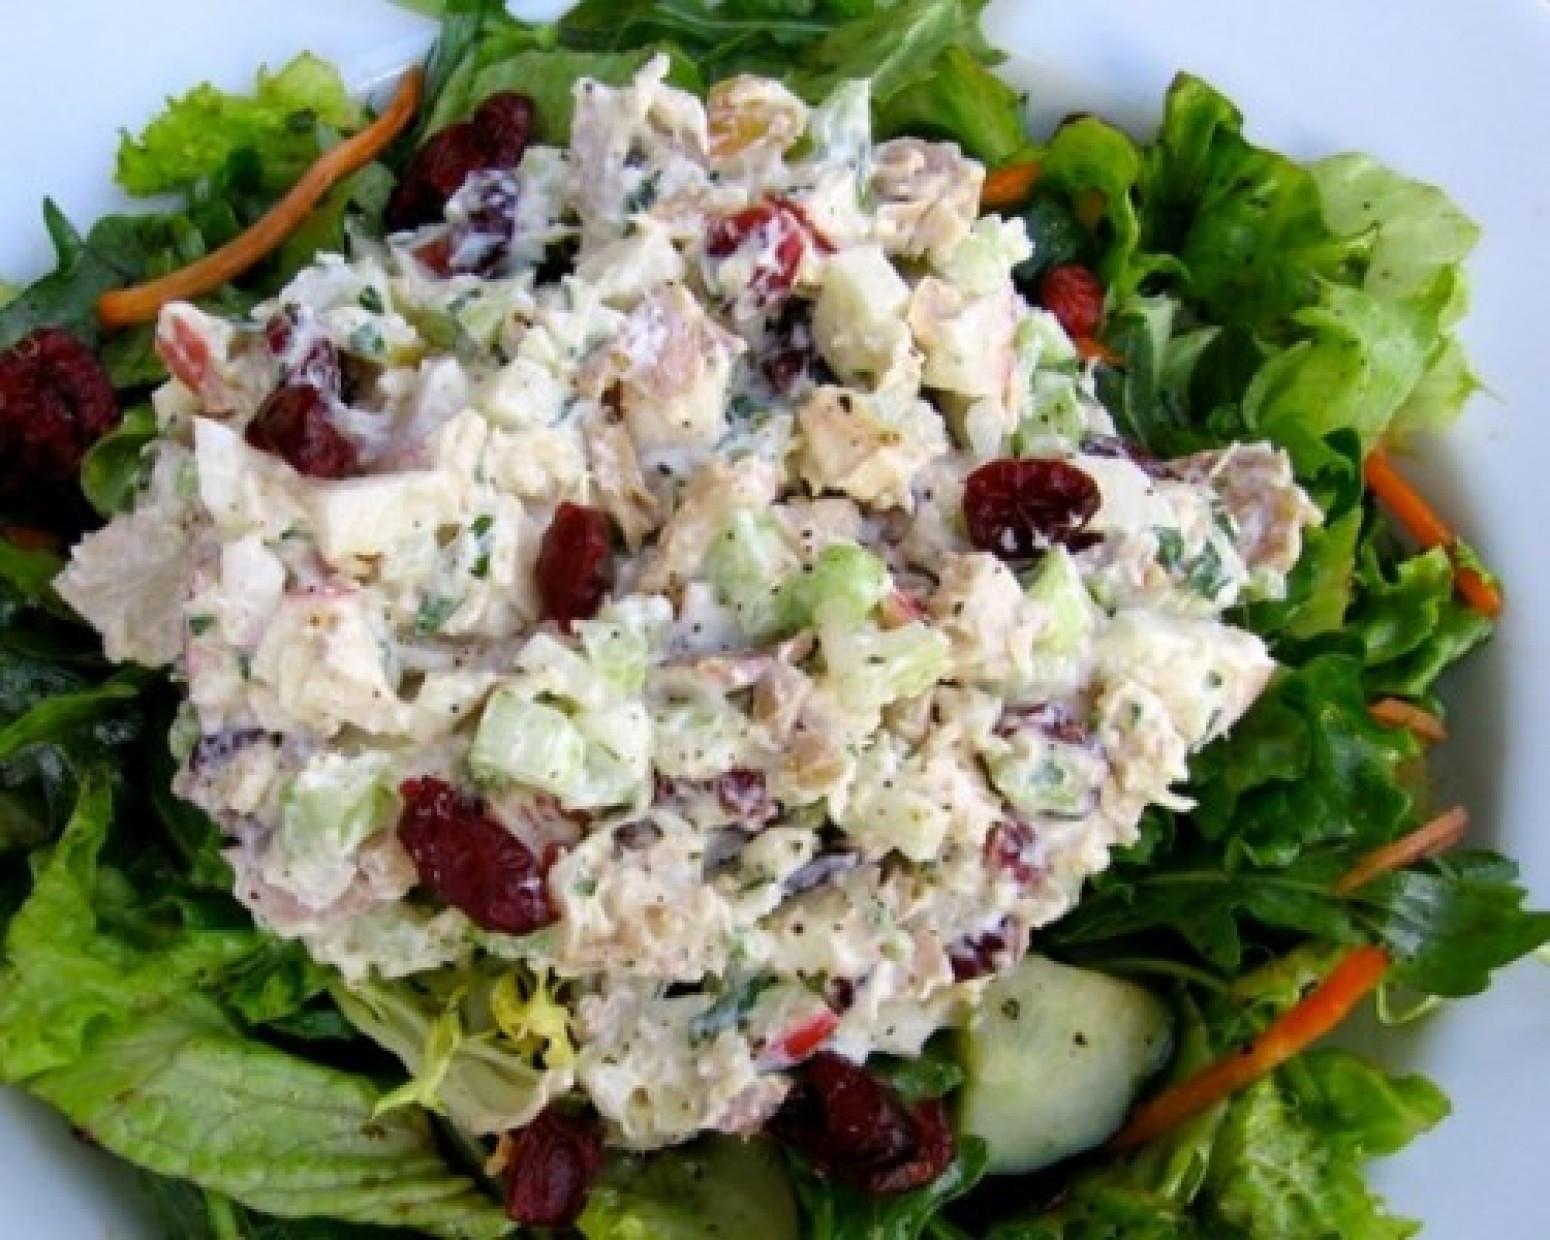 Chicken Salad Recipe Healthy  Healthy Chicken Salad with Apples & Cranberries Recipe